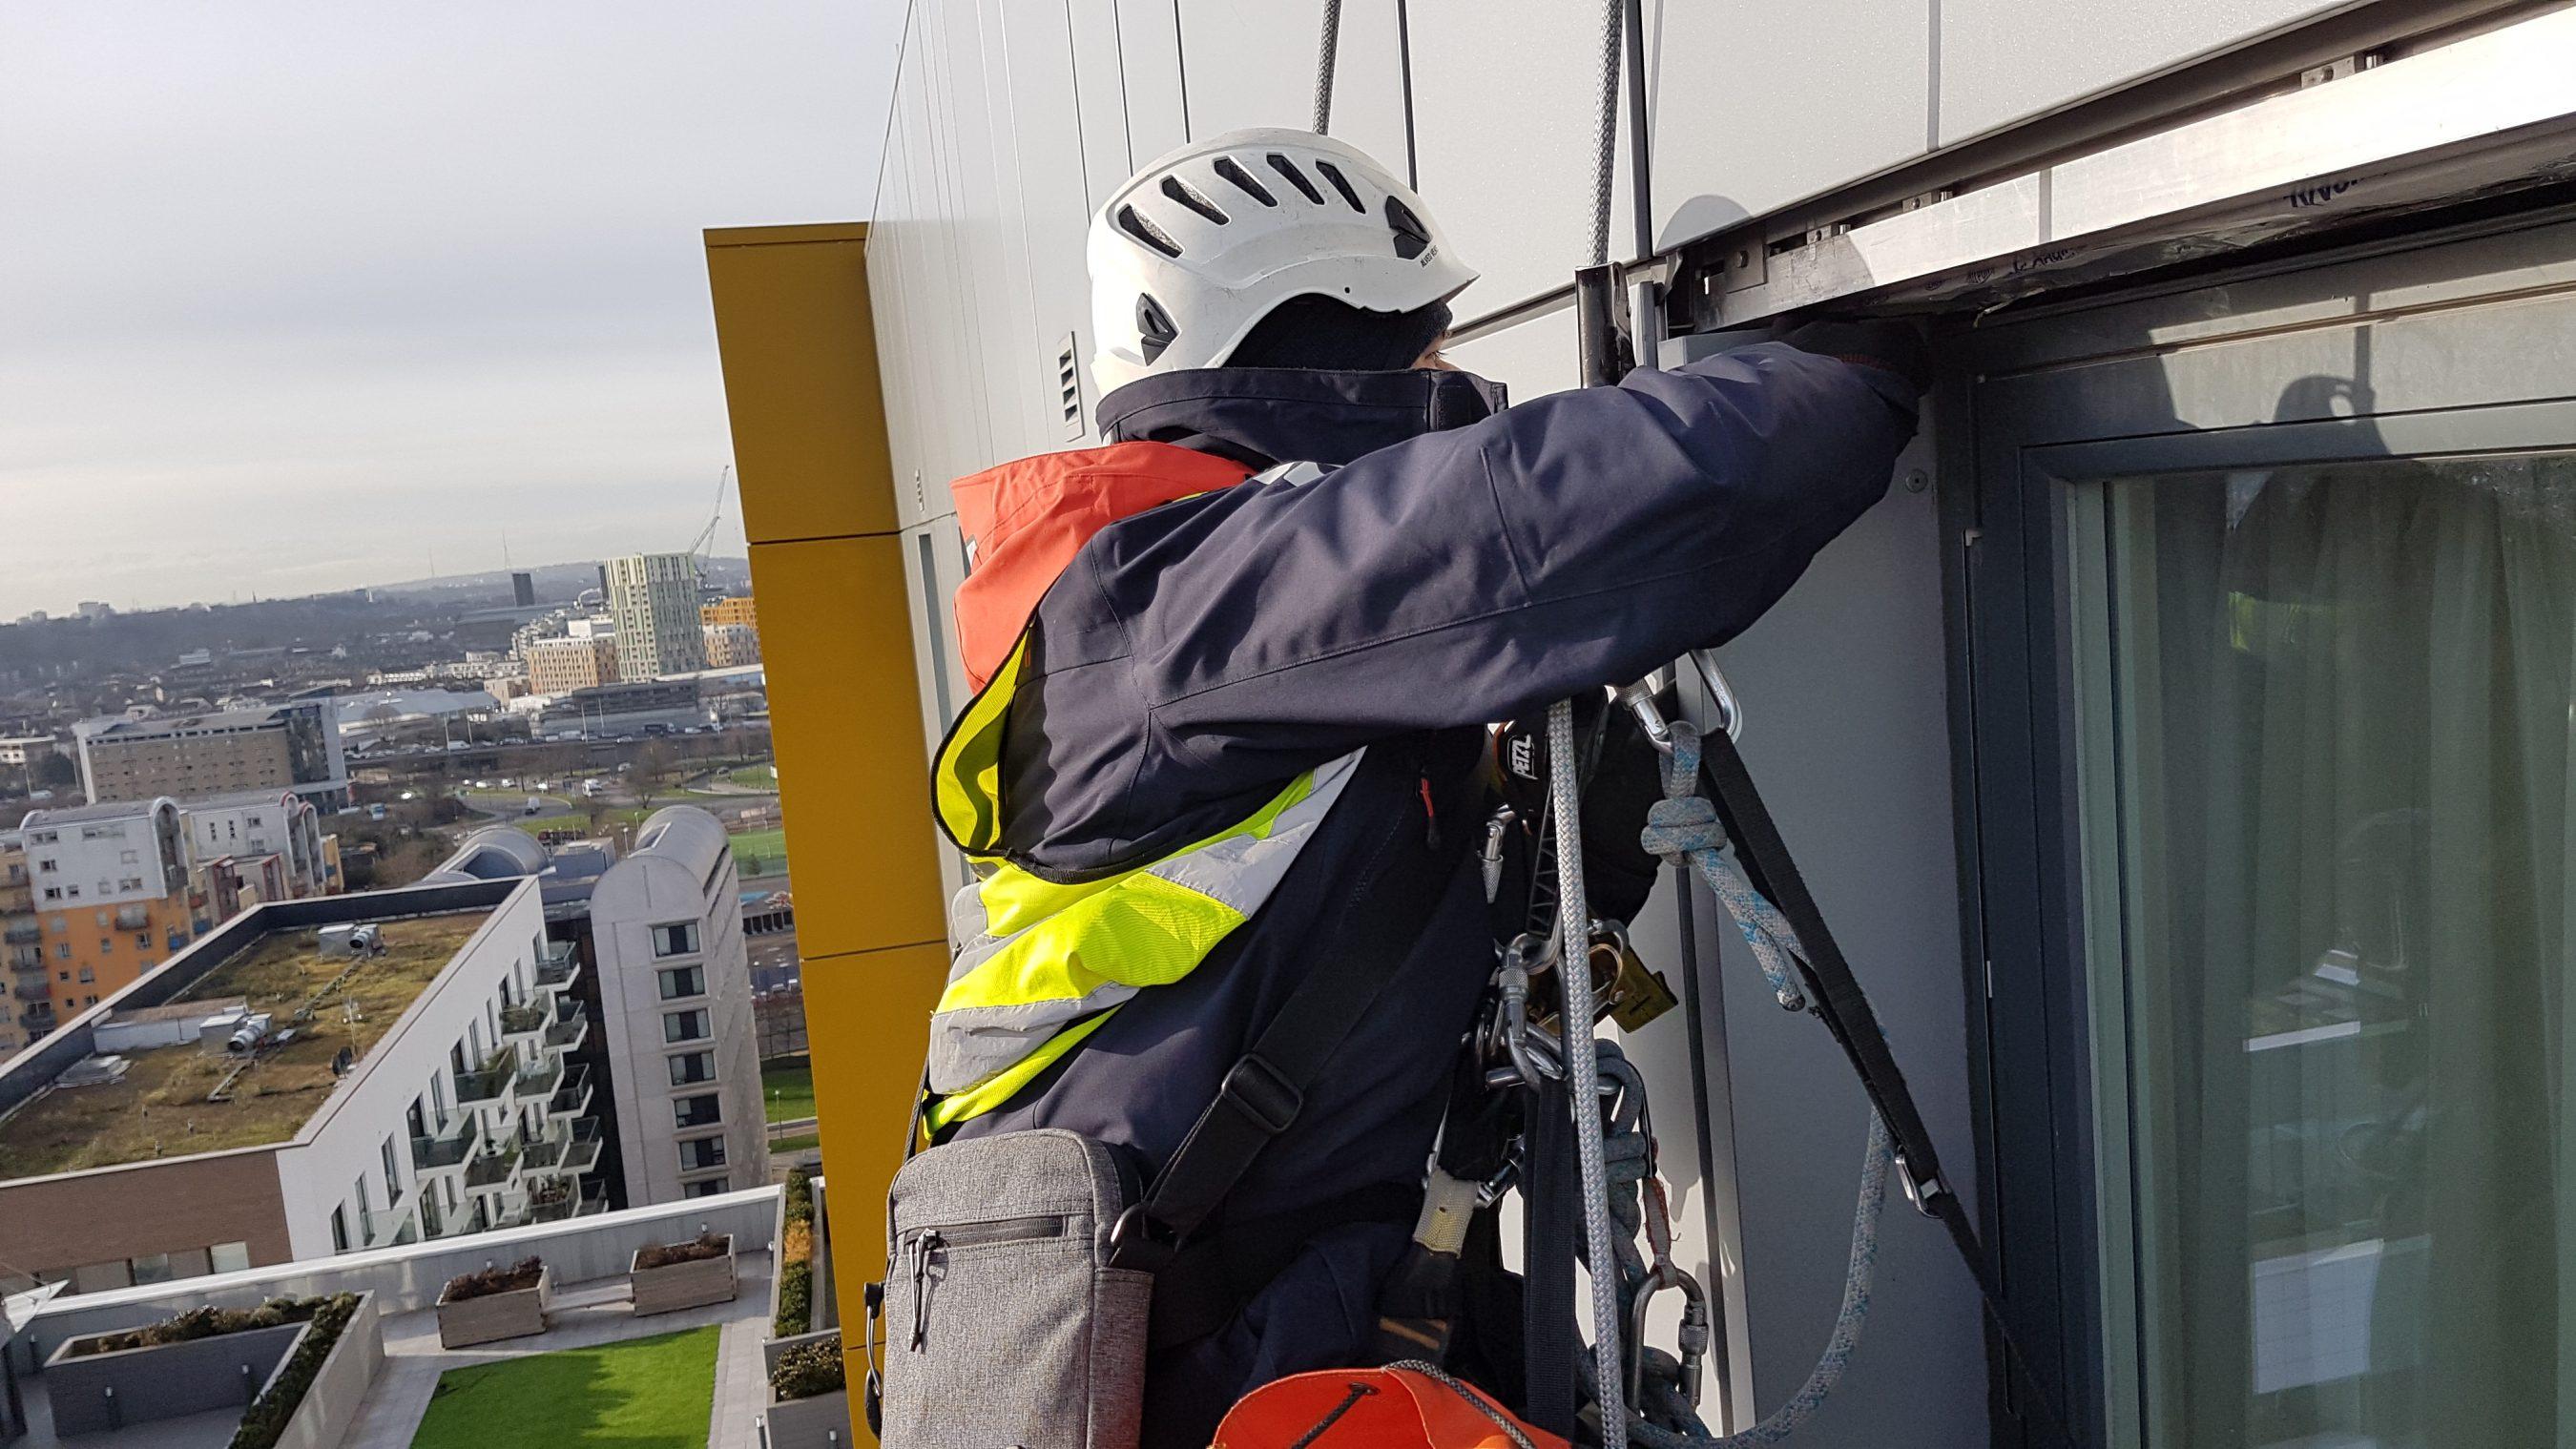 High level cladding repair